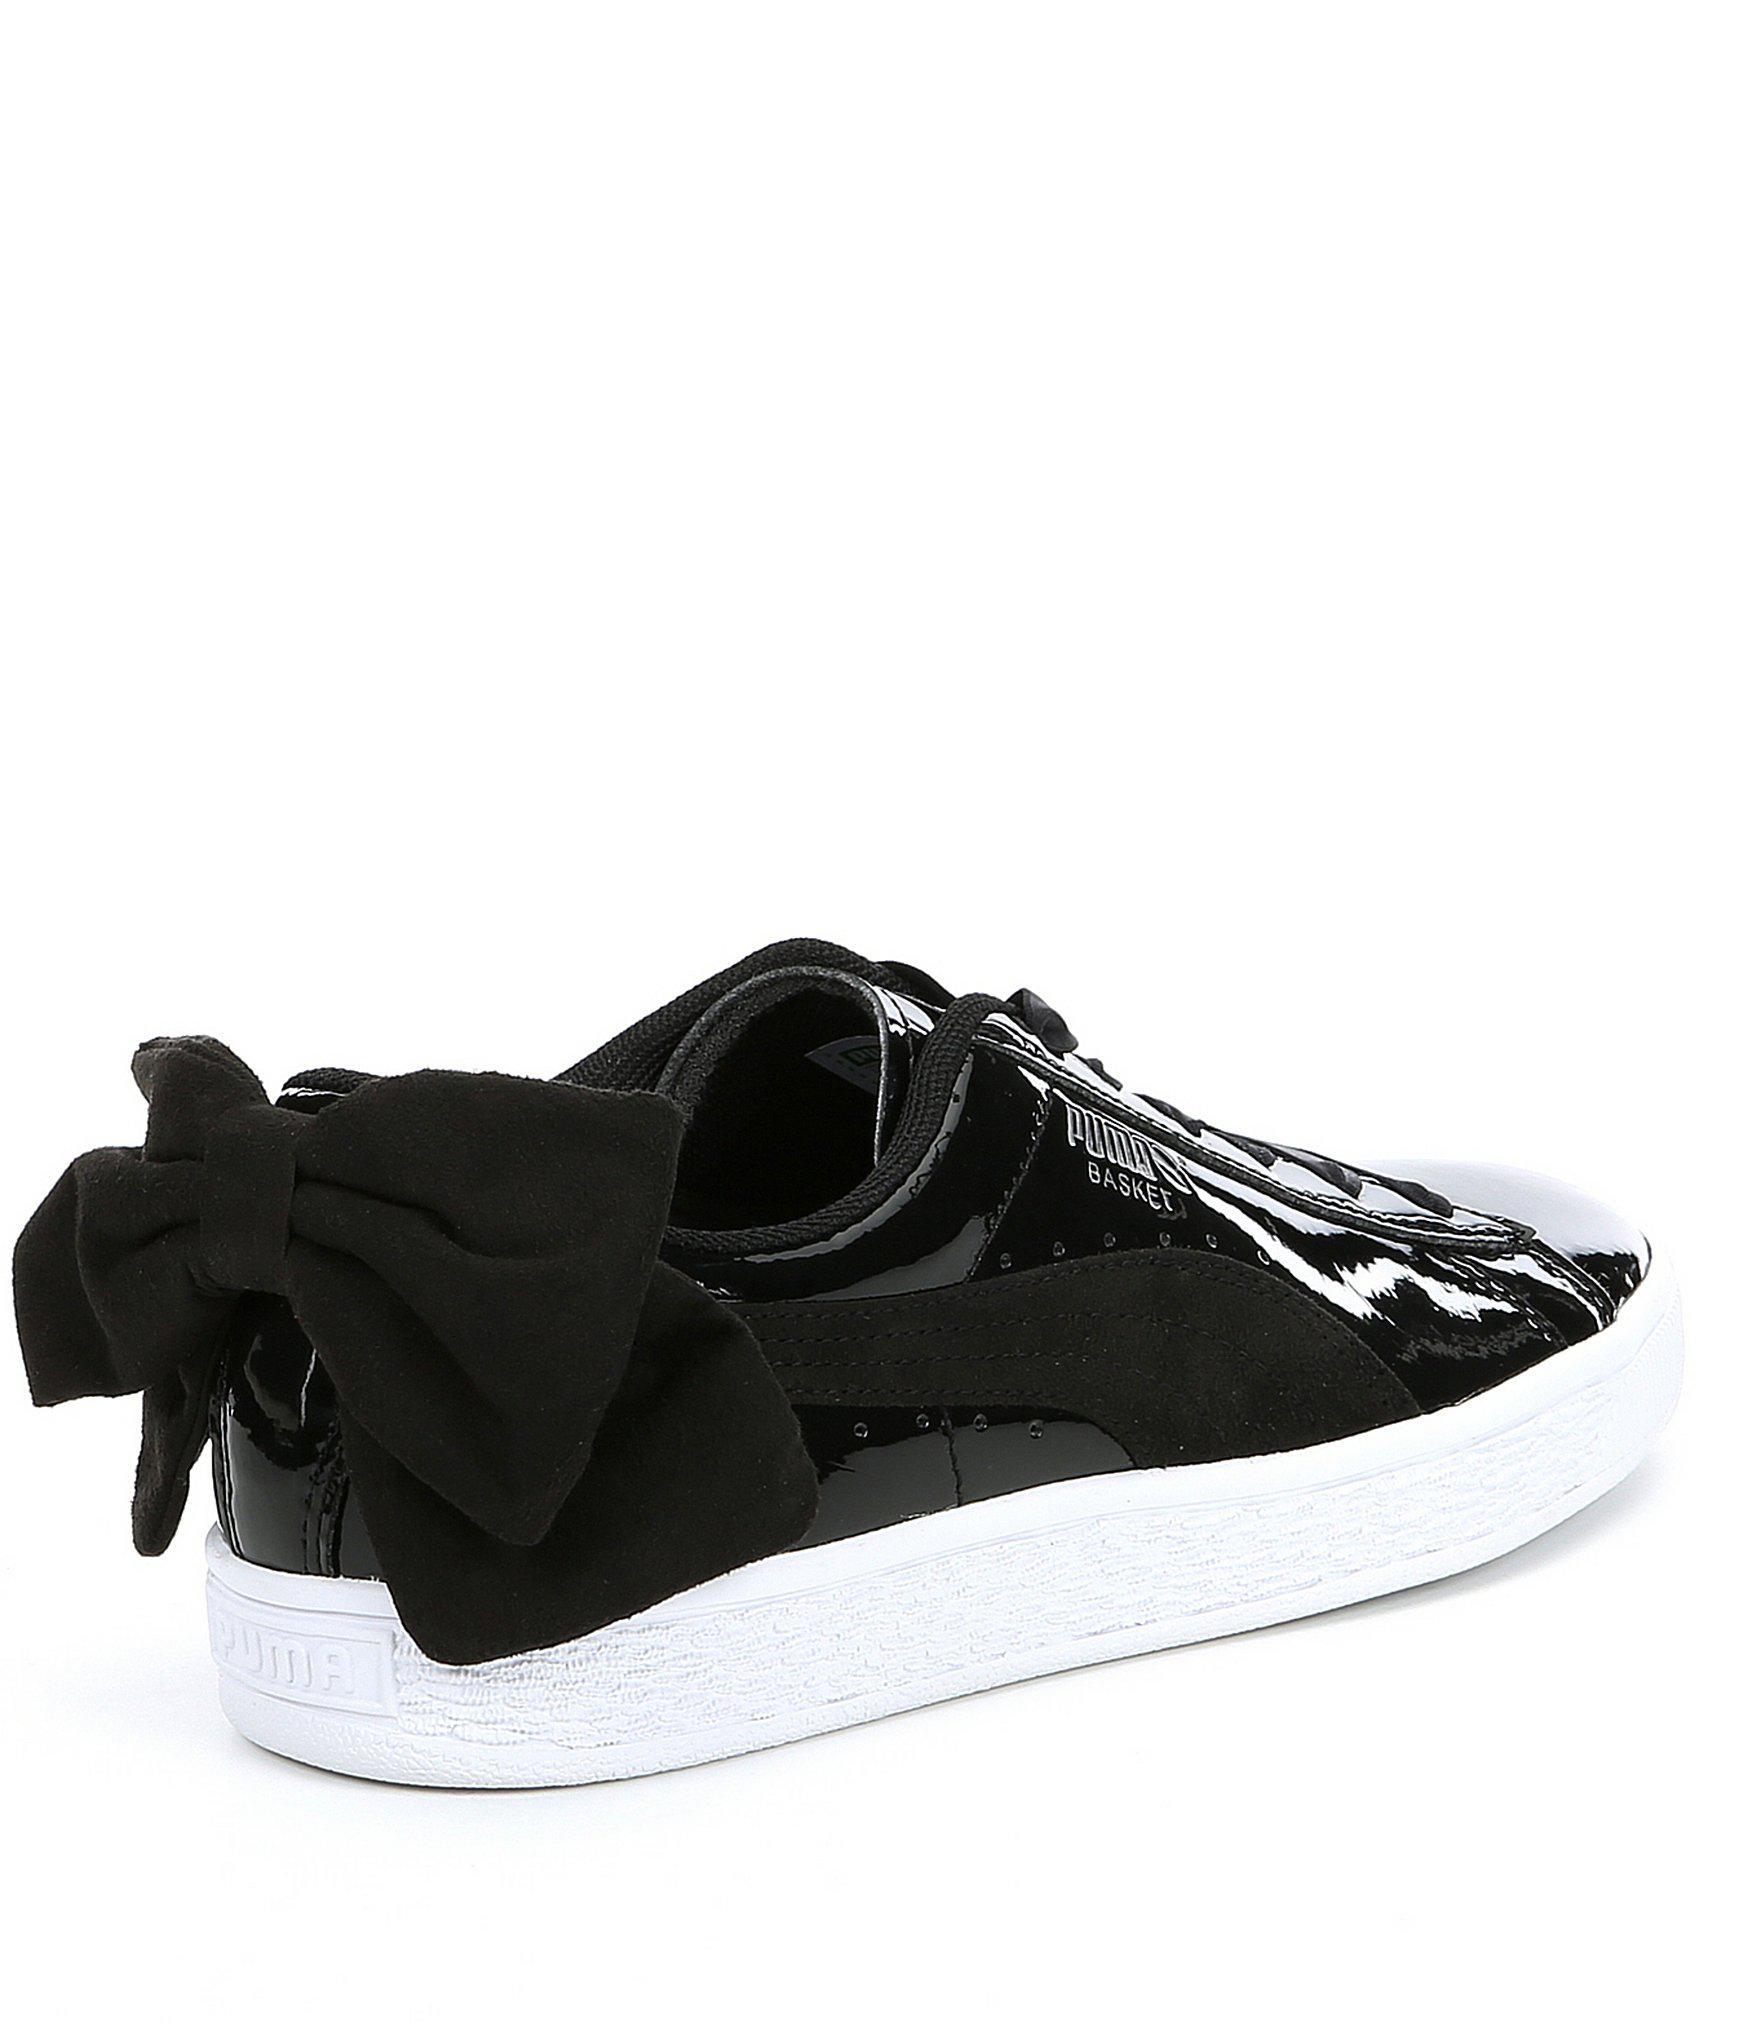 big sale 688fd afeec Women's Black Basket Bow Patent Leather Sb Sneakers